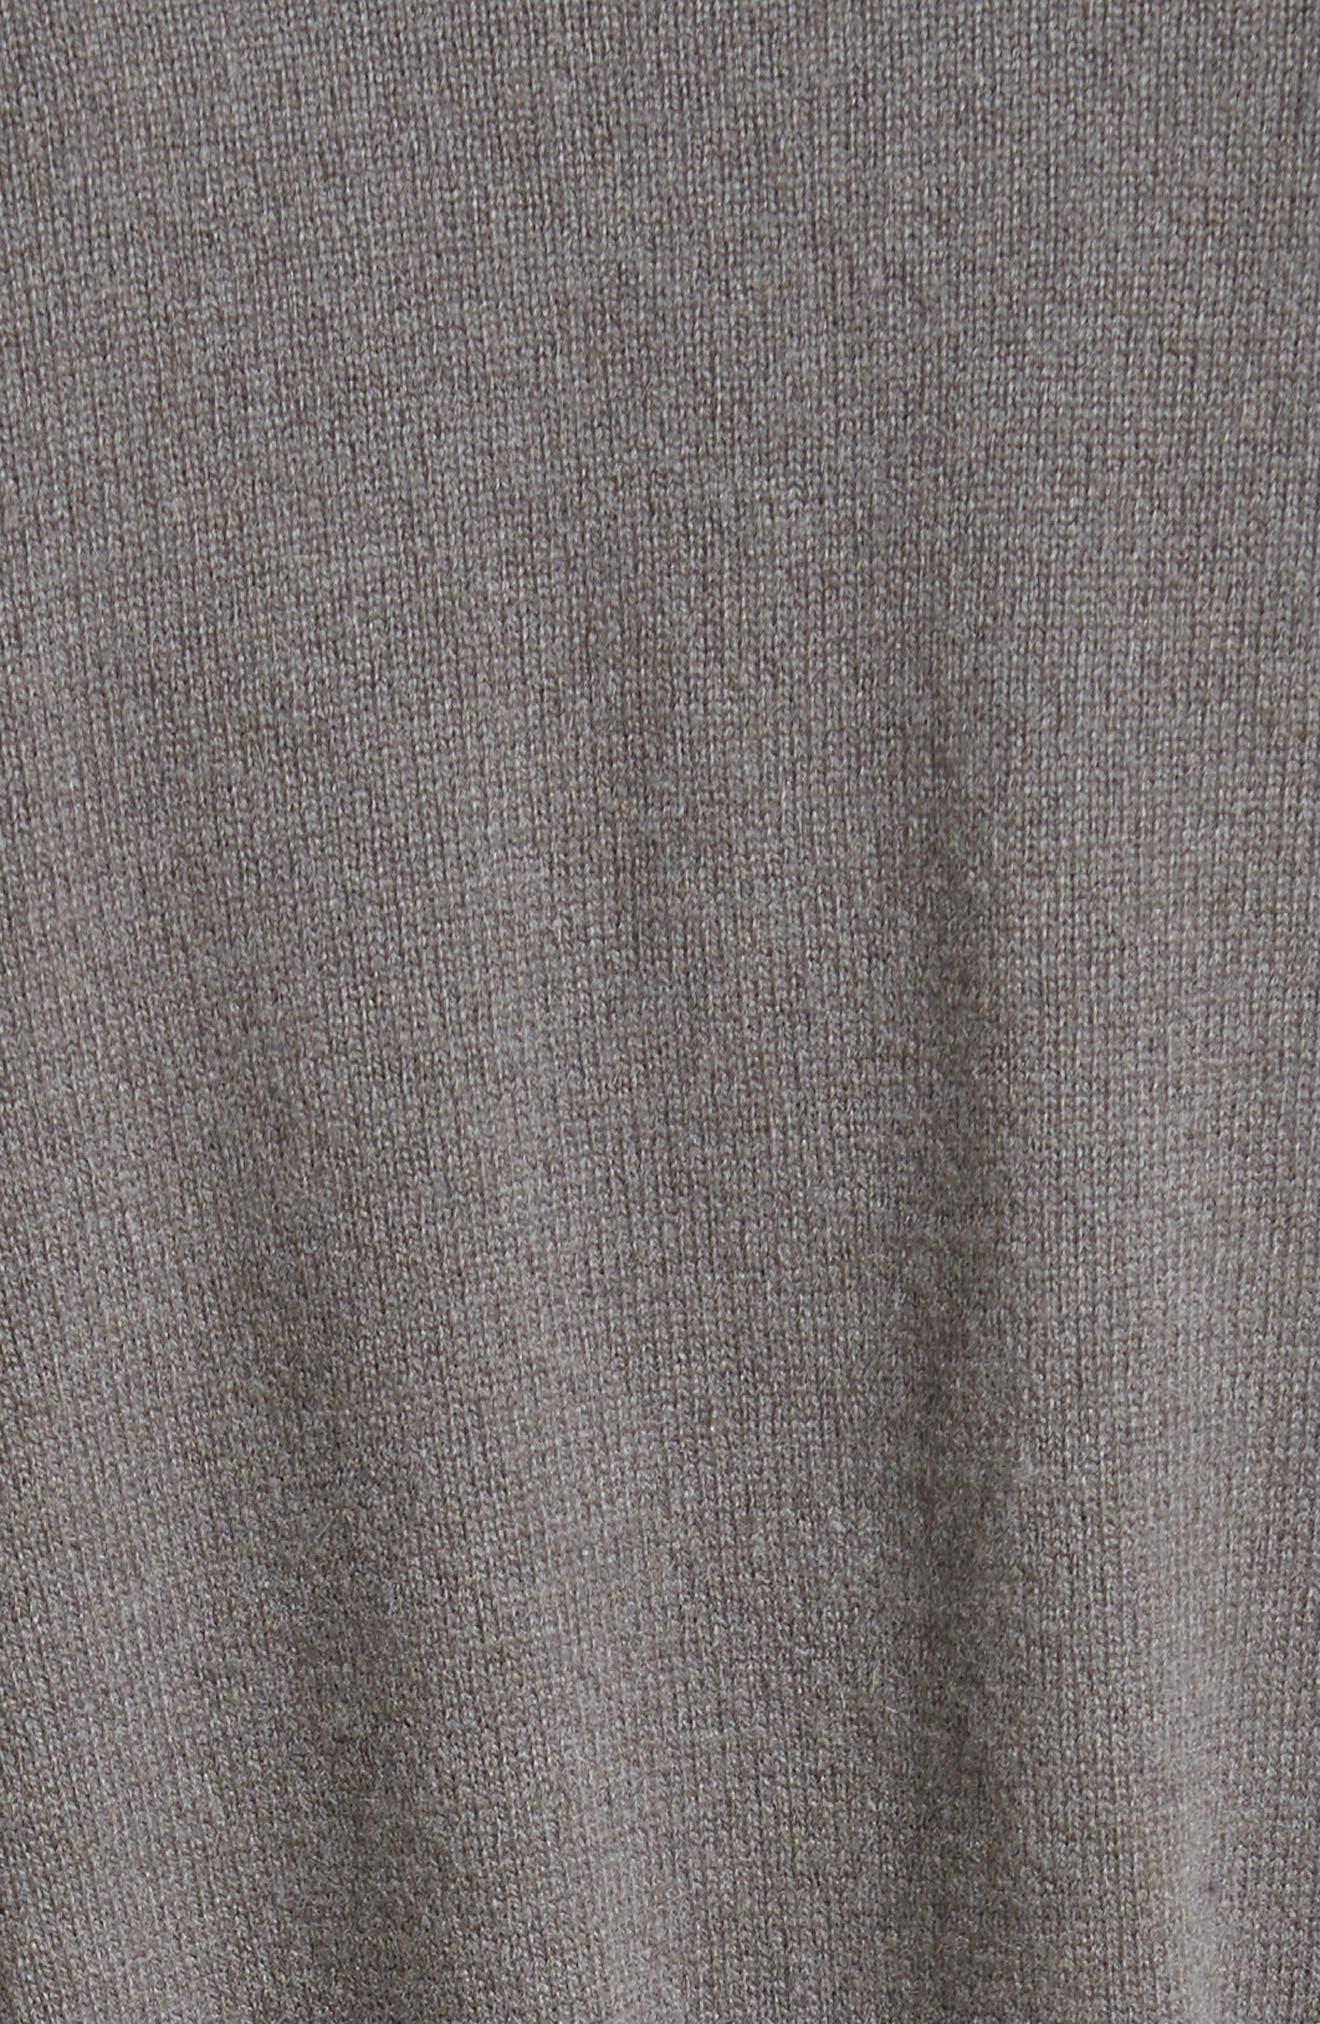 Suede Trim Wool, Silk & Cashmere Cardigan,                             Alternate thumbnail 5, color,                             030